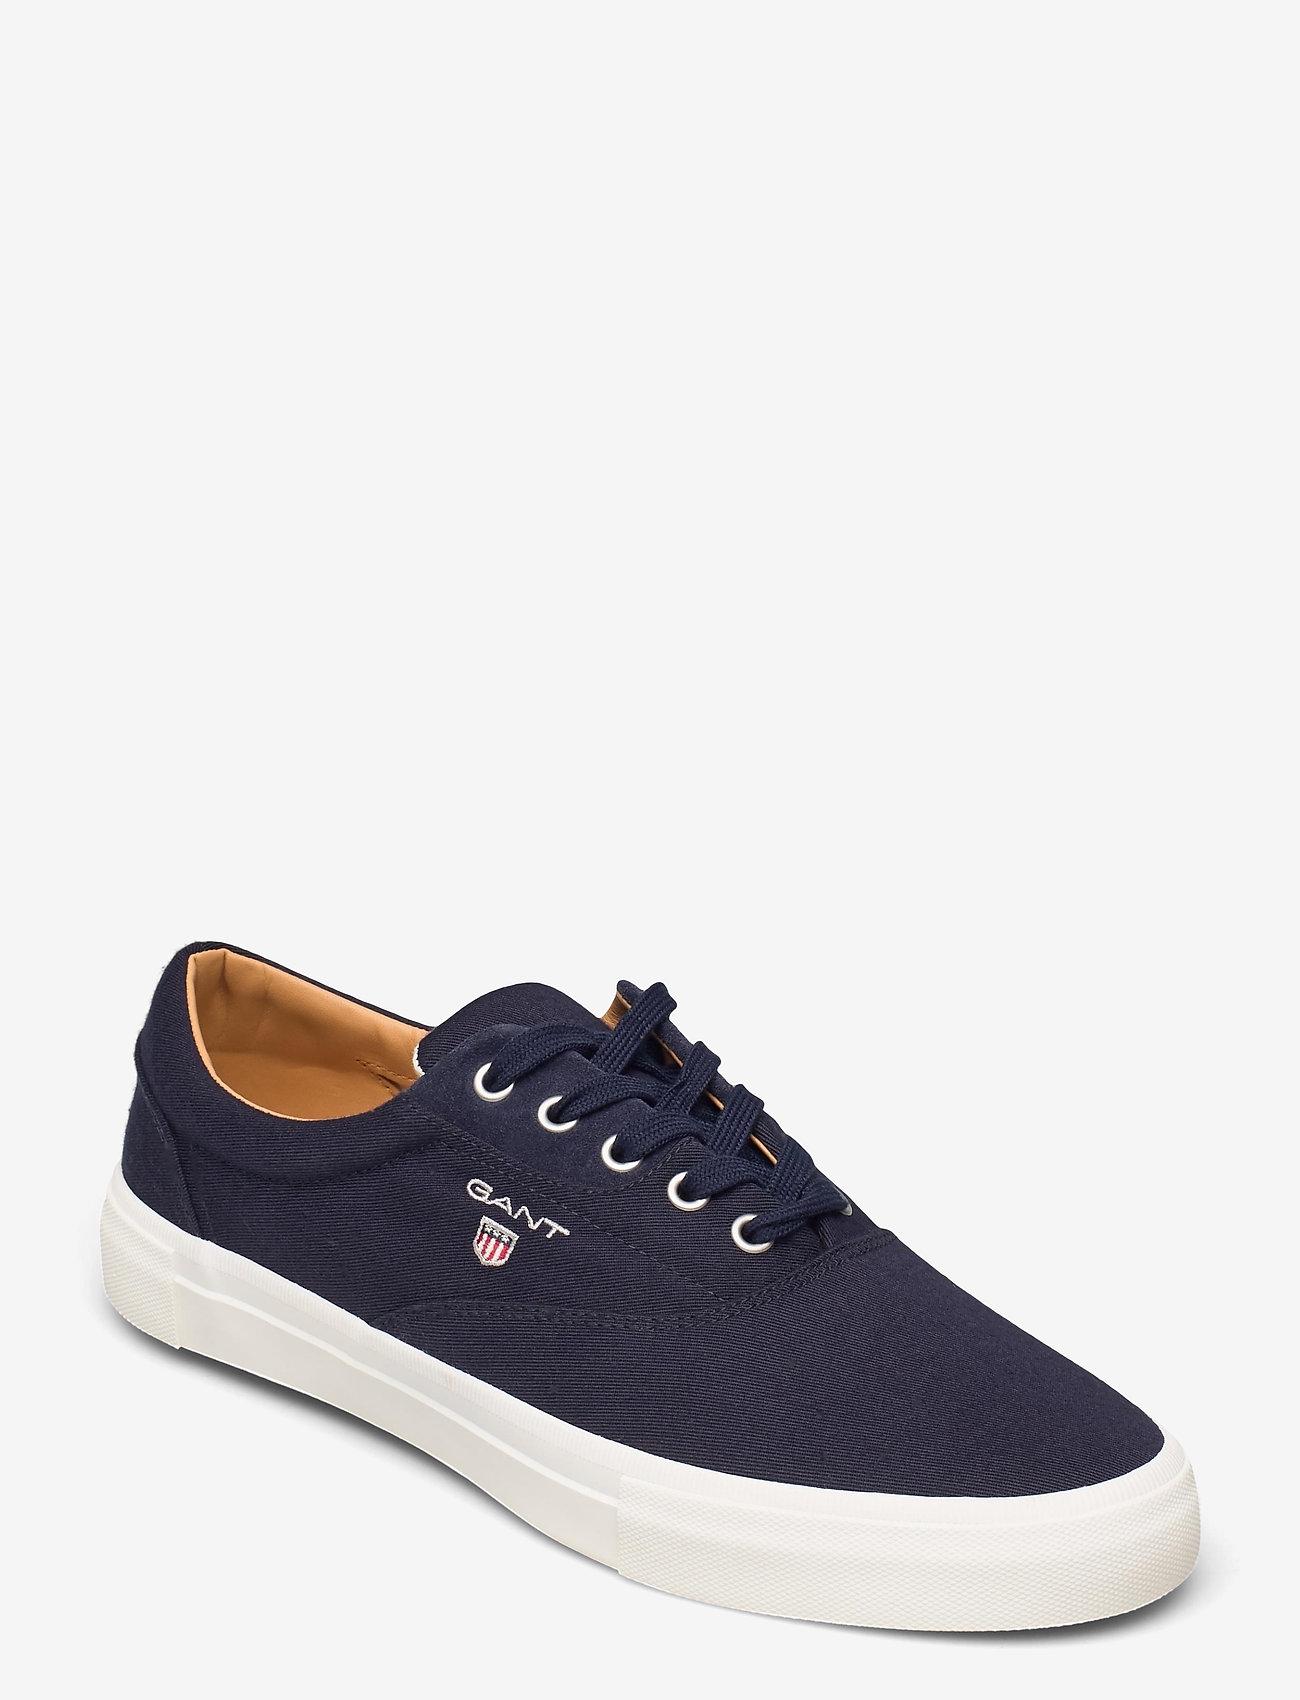 GANT - Sundale Low lace sho - low tops - marine - 0